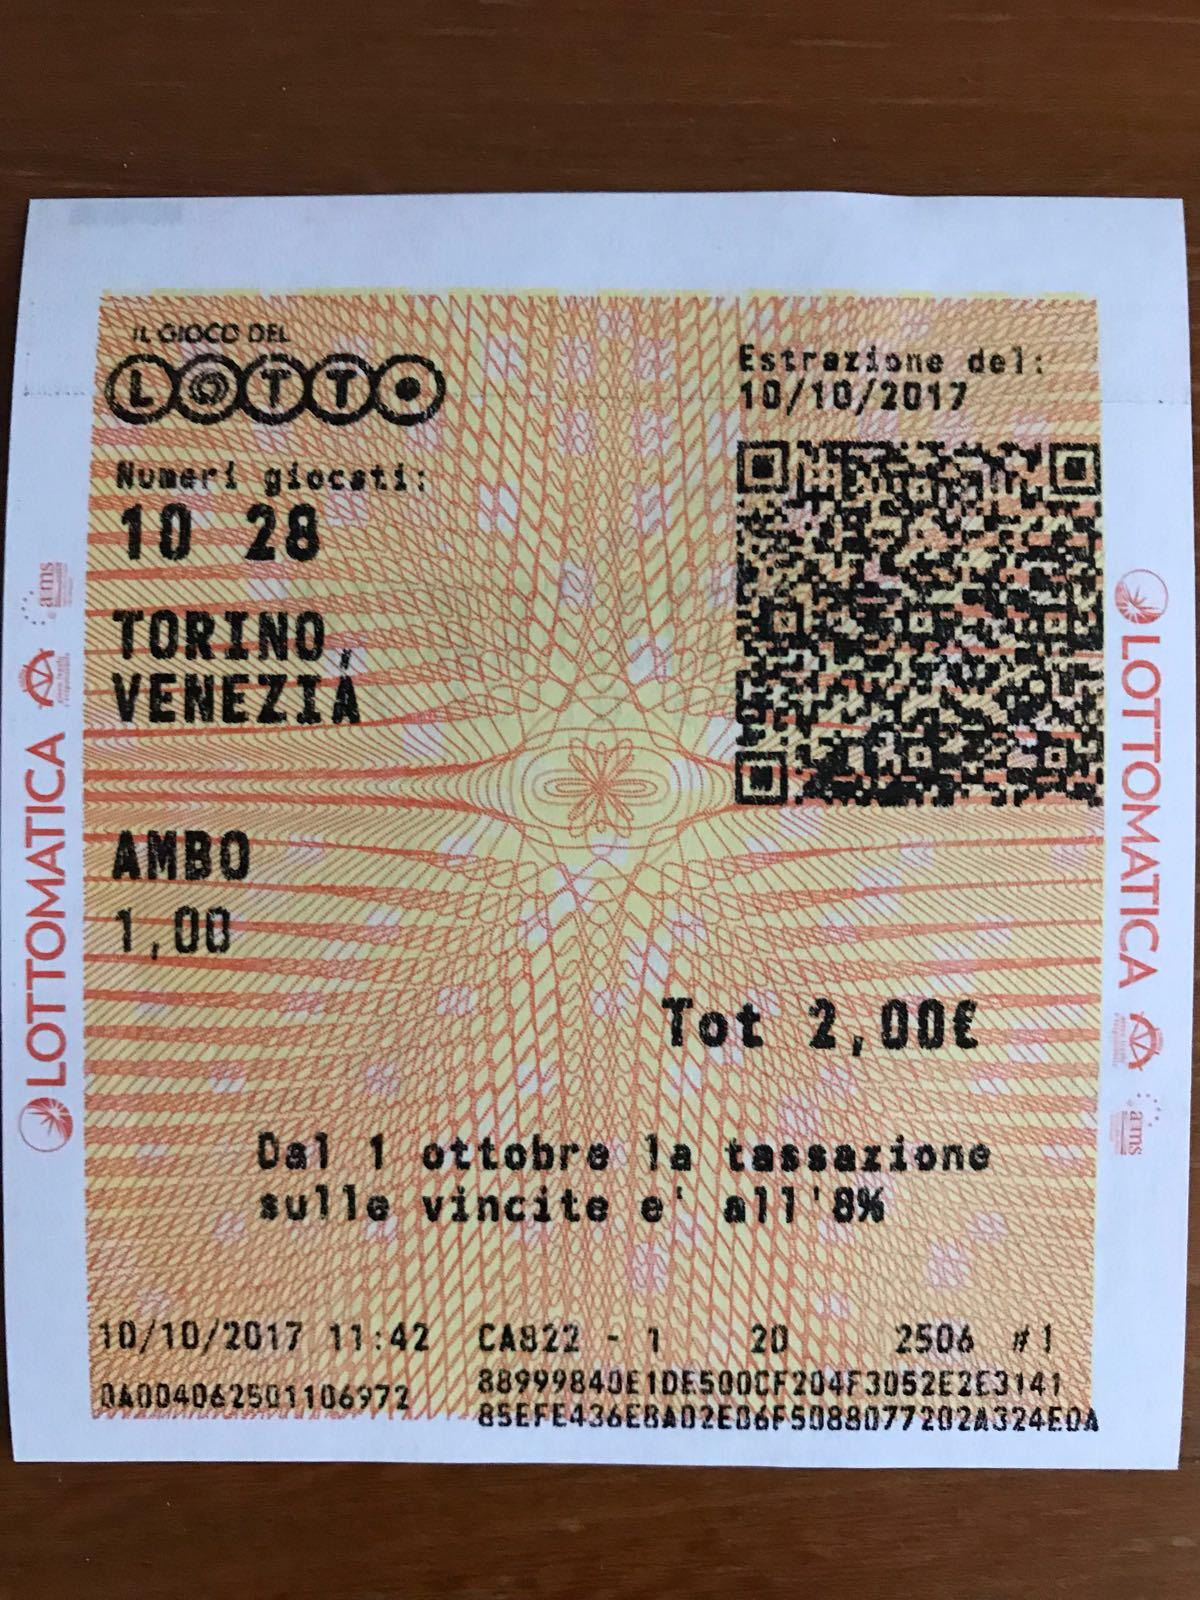 SMS ULTIMO MIN GARGIULO - AMBO S. 10.28 TO 5C 3